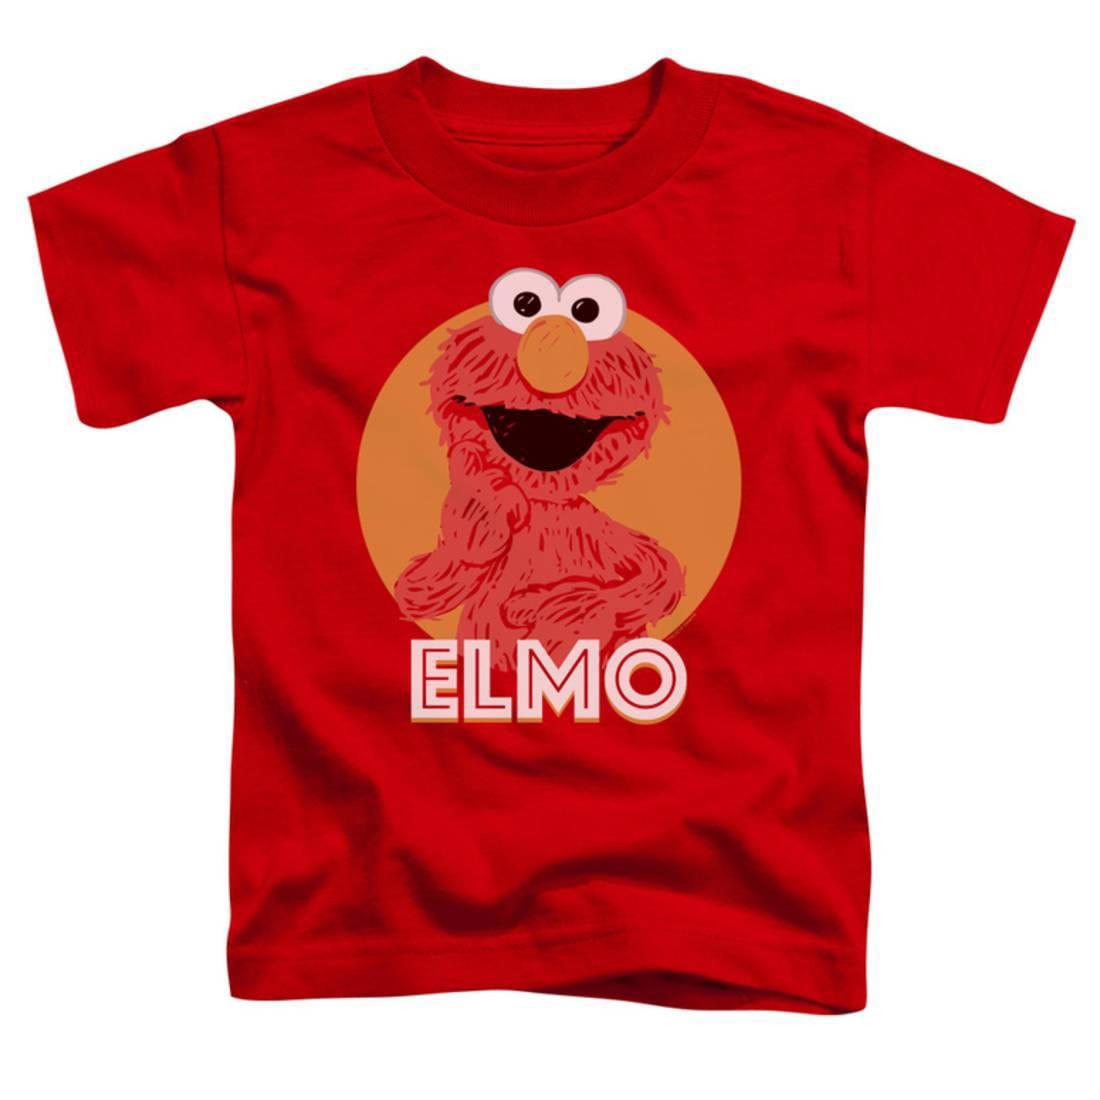 Toddler: Sesame Street- Smiley Elmo Apparel Baby T-Shirt - Red